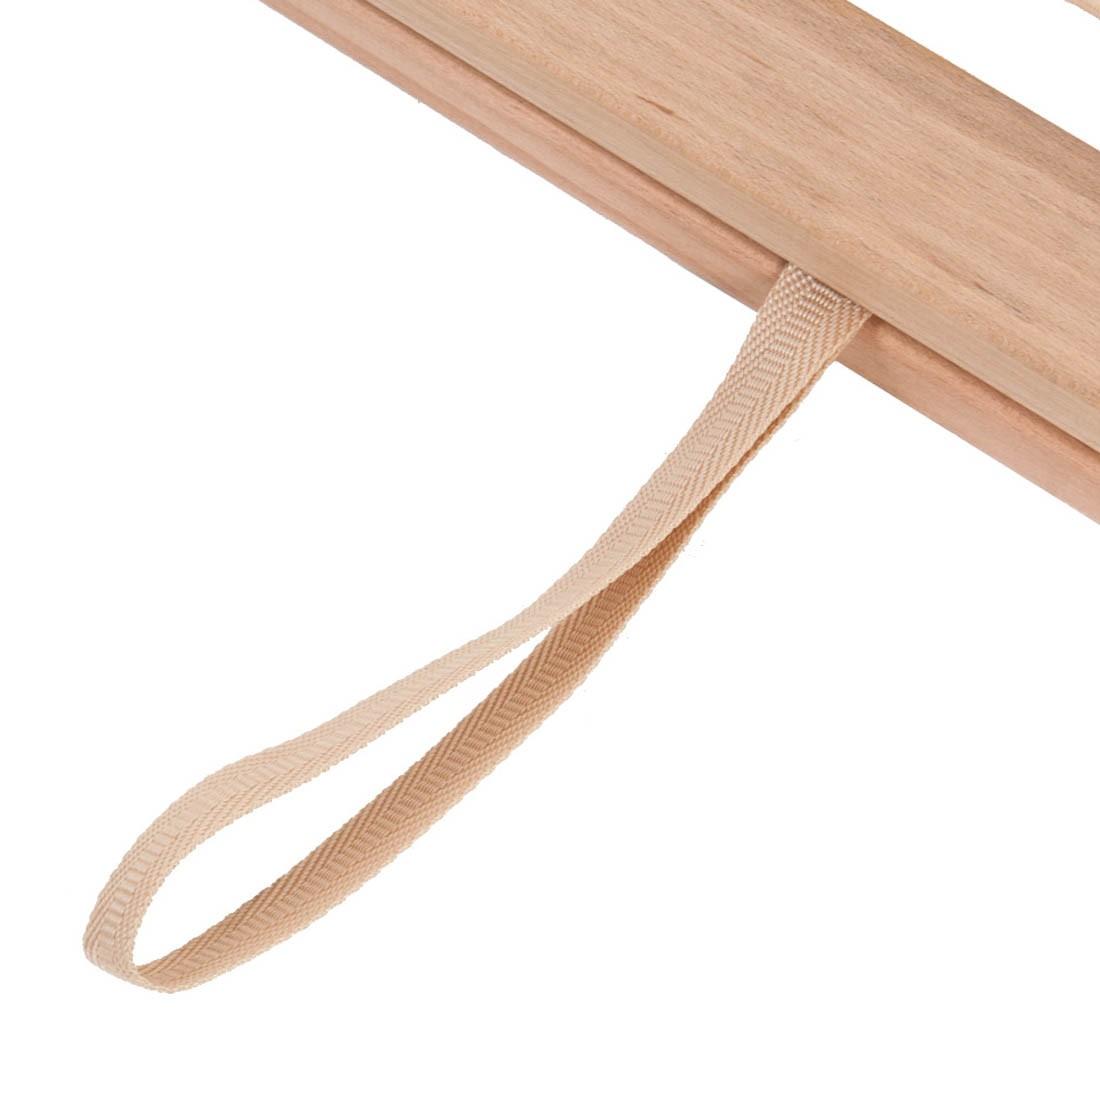 lattenroste zum zusammenbauen ikea schlafzimmer pinterest deko modern bettdecken aus kamelhaar. Black Bedroom Furniture Sets. Home Design Ideas